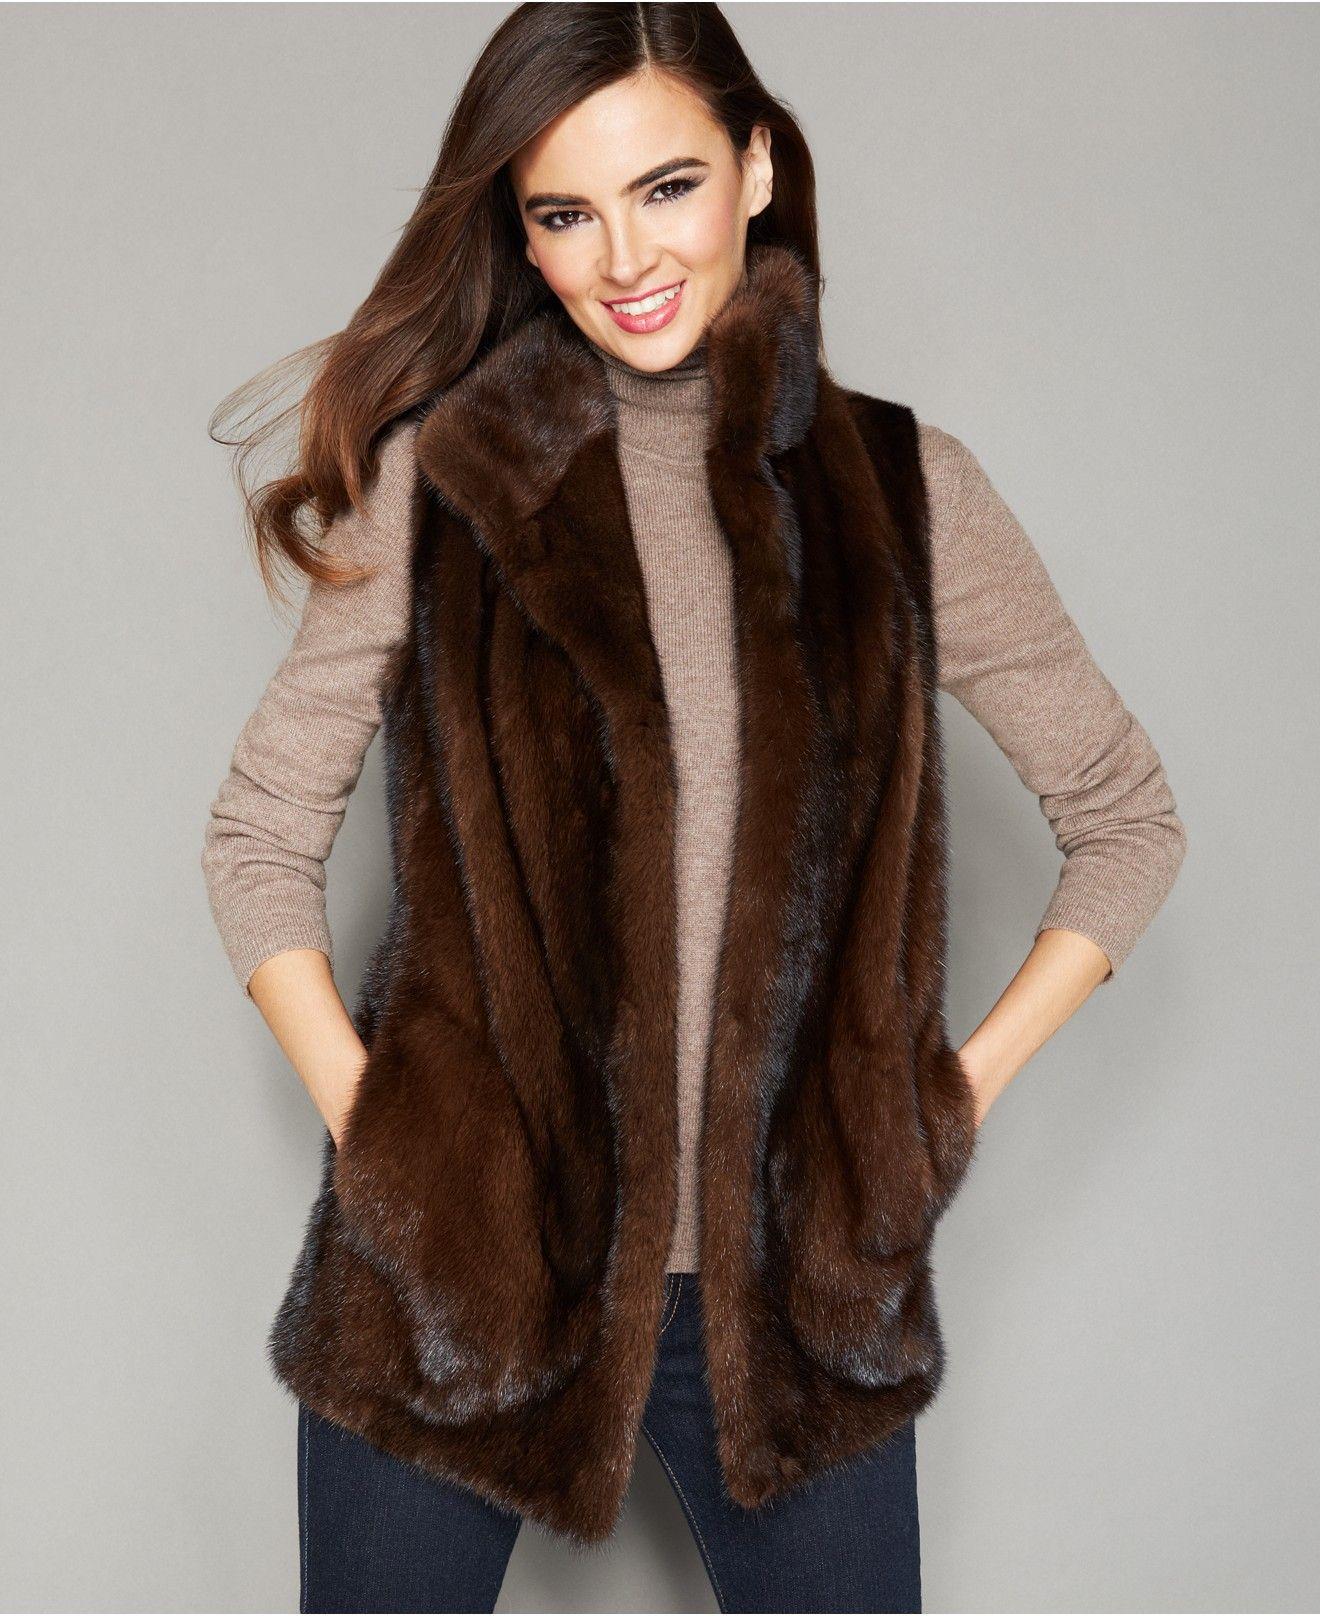 b14d7d0c389 The Fur Vault Stand-Collar Mink Fur Vest - Coats - Women - Macy s